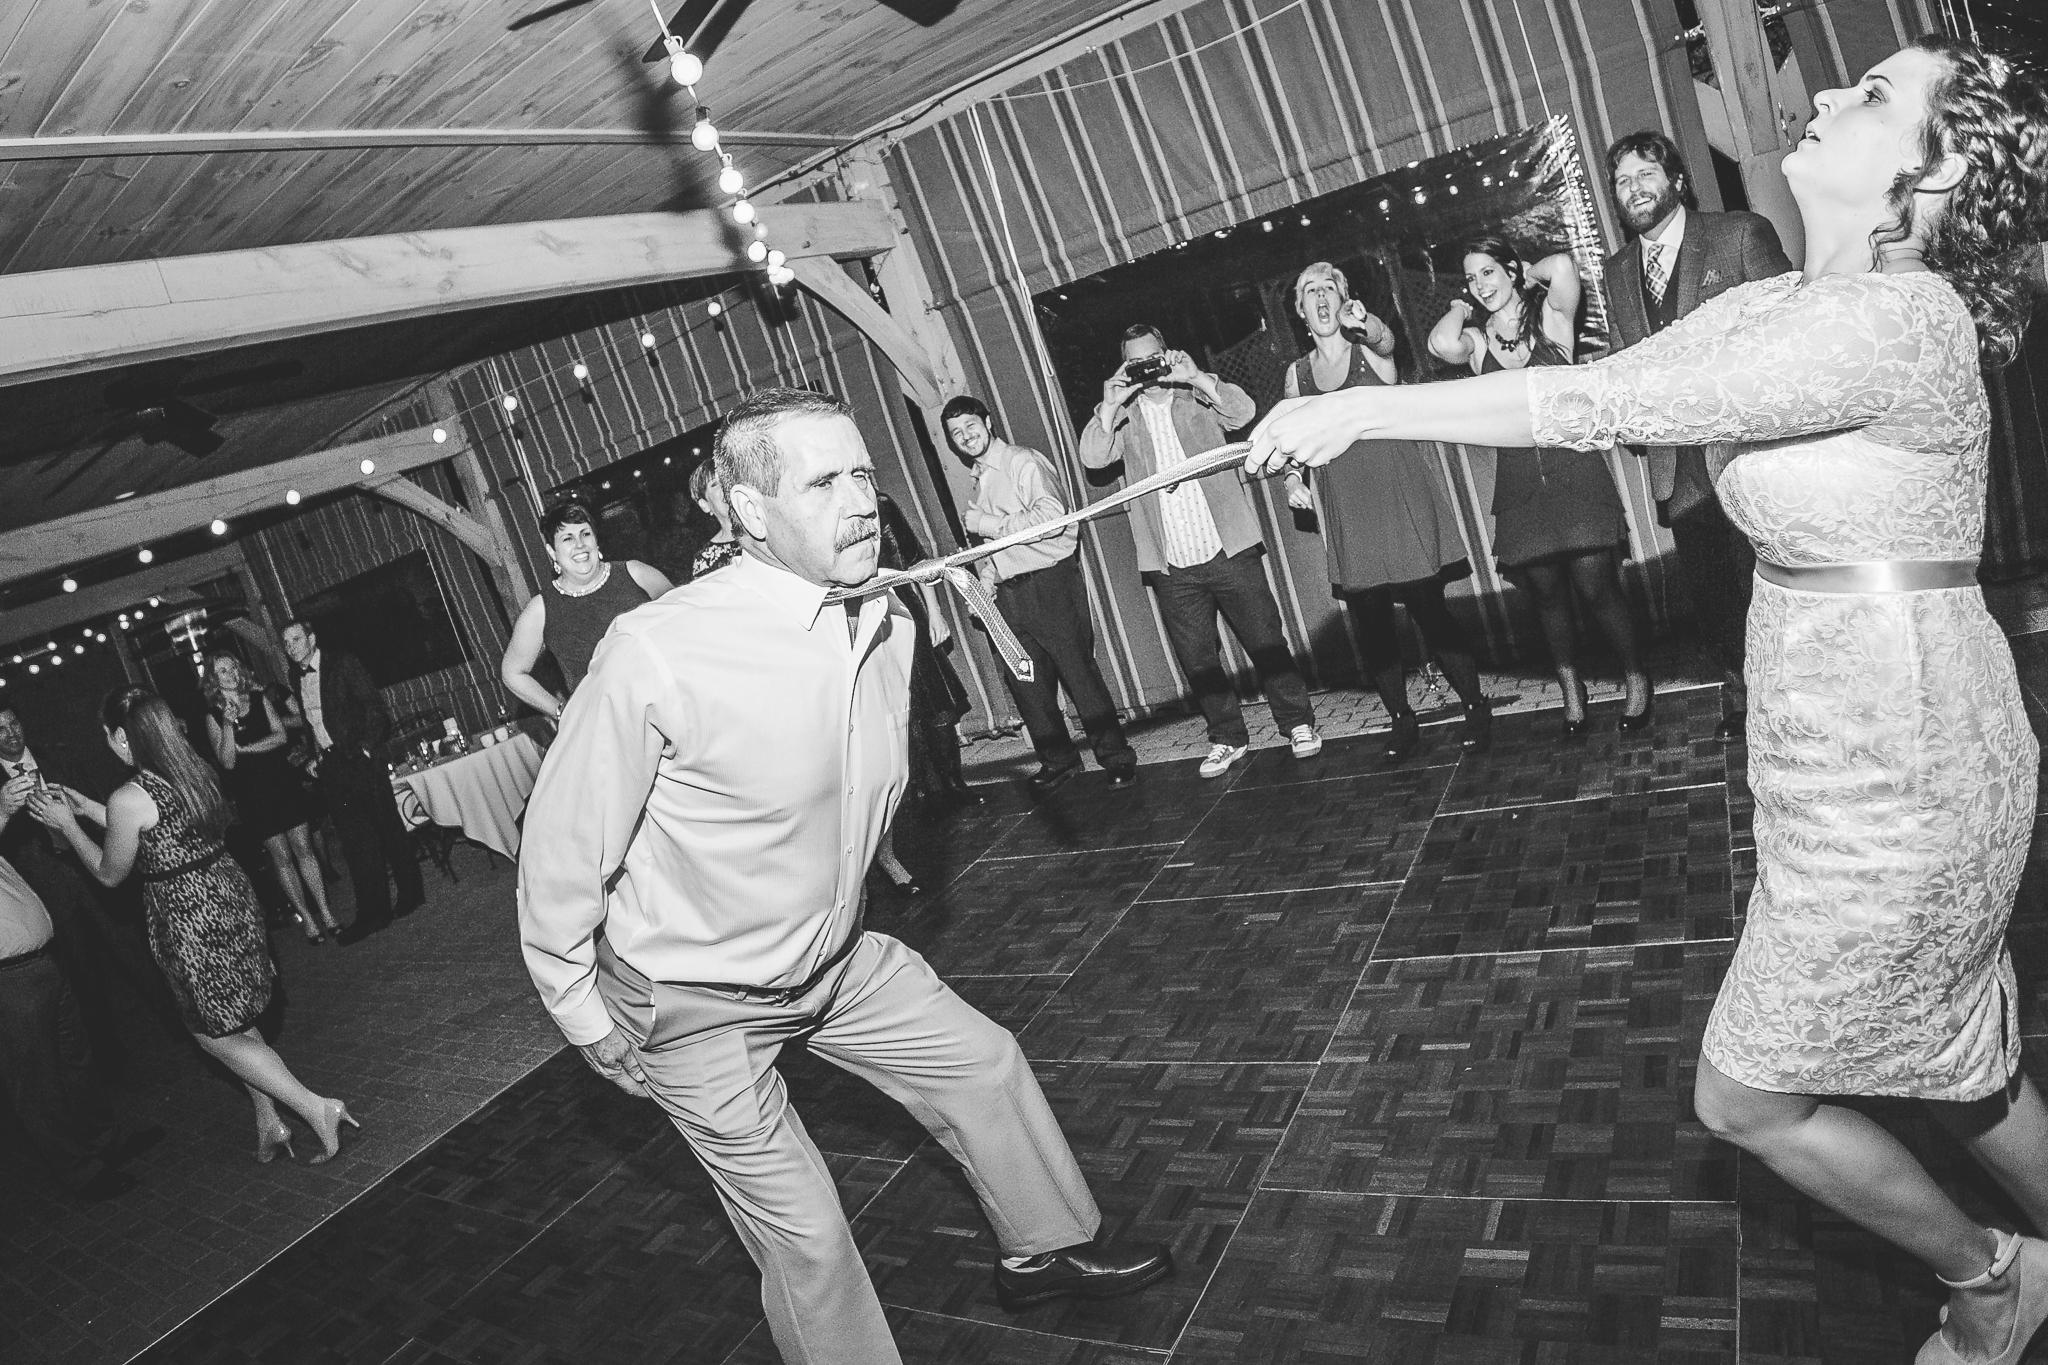 camuglia-whomstudio-chelsea_and_andy-nycphotographer-wedding-brooklyn-buffalo-timberlodge-167-5735.jpg